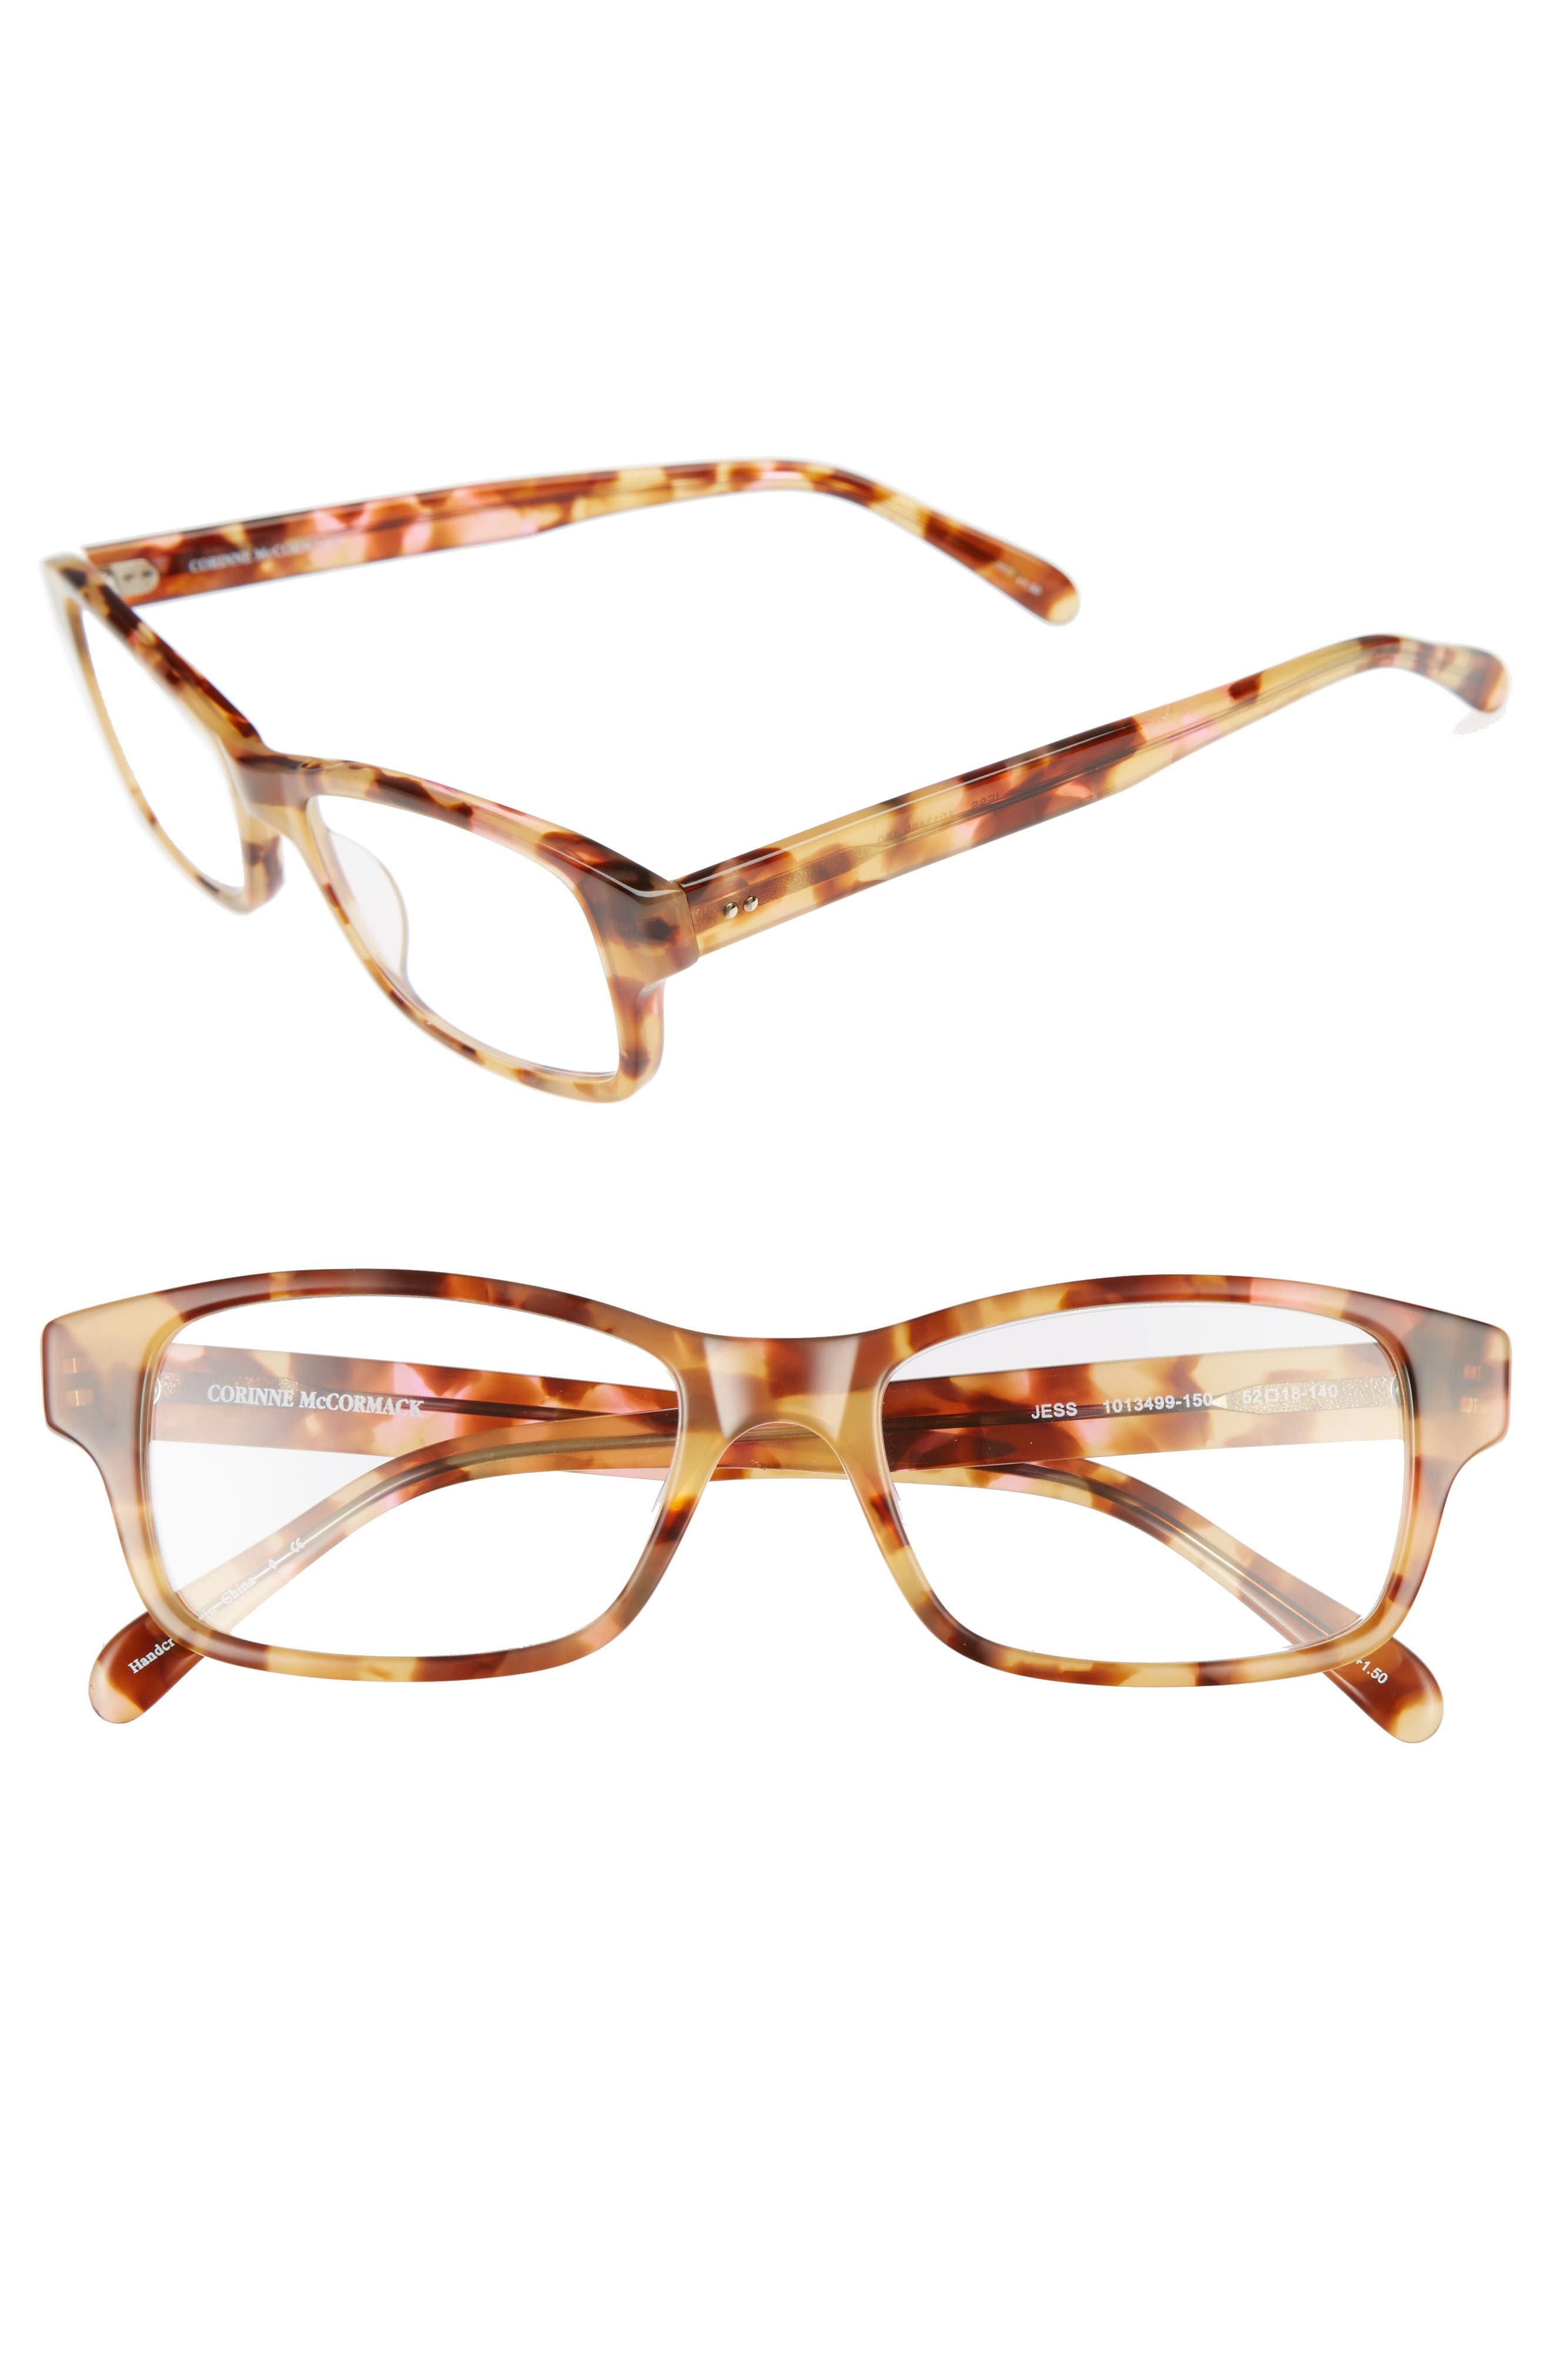 Corinne McCormack 'Jess' 46mm Reading Glasses